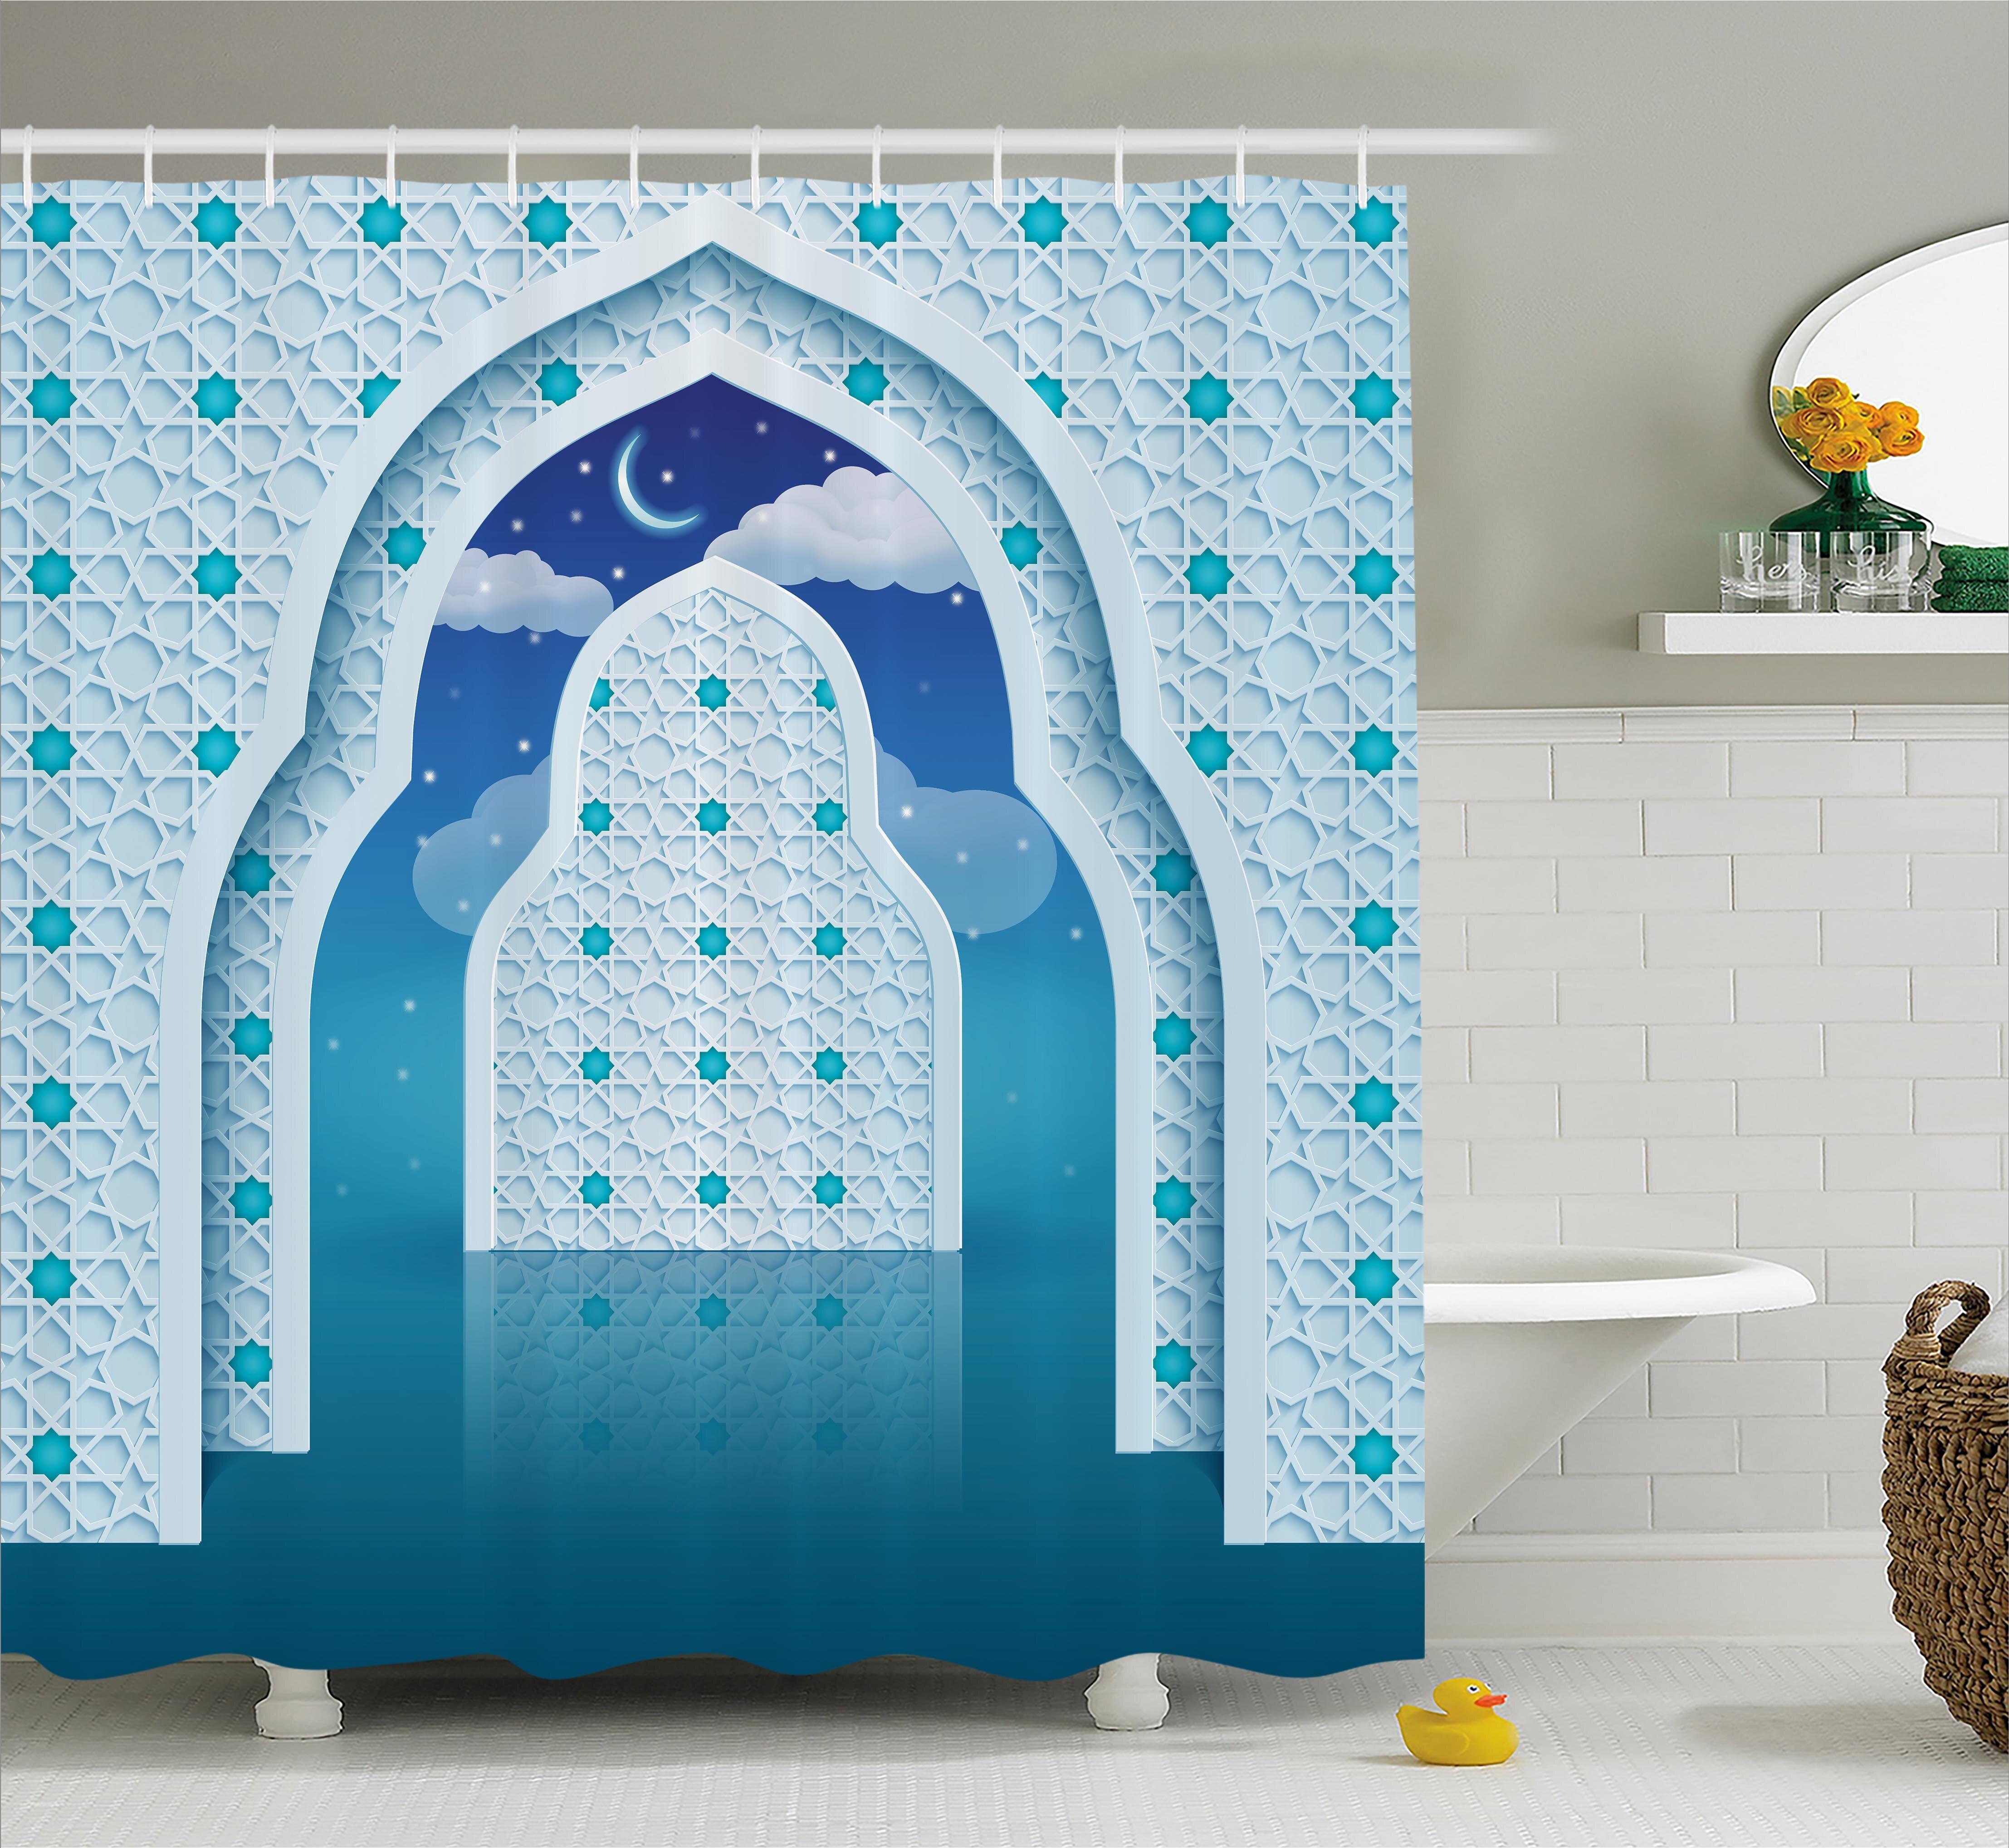 Bloomsbury Market Askham Arabic Signs at Night Shower Curtain | Wayfair